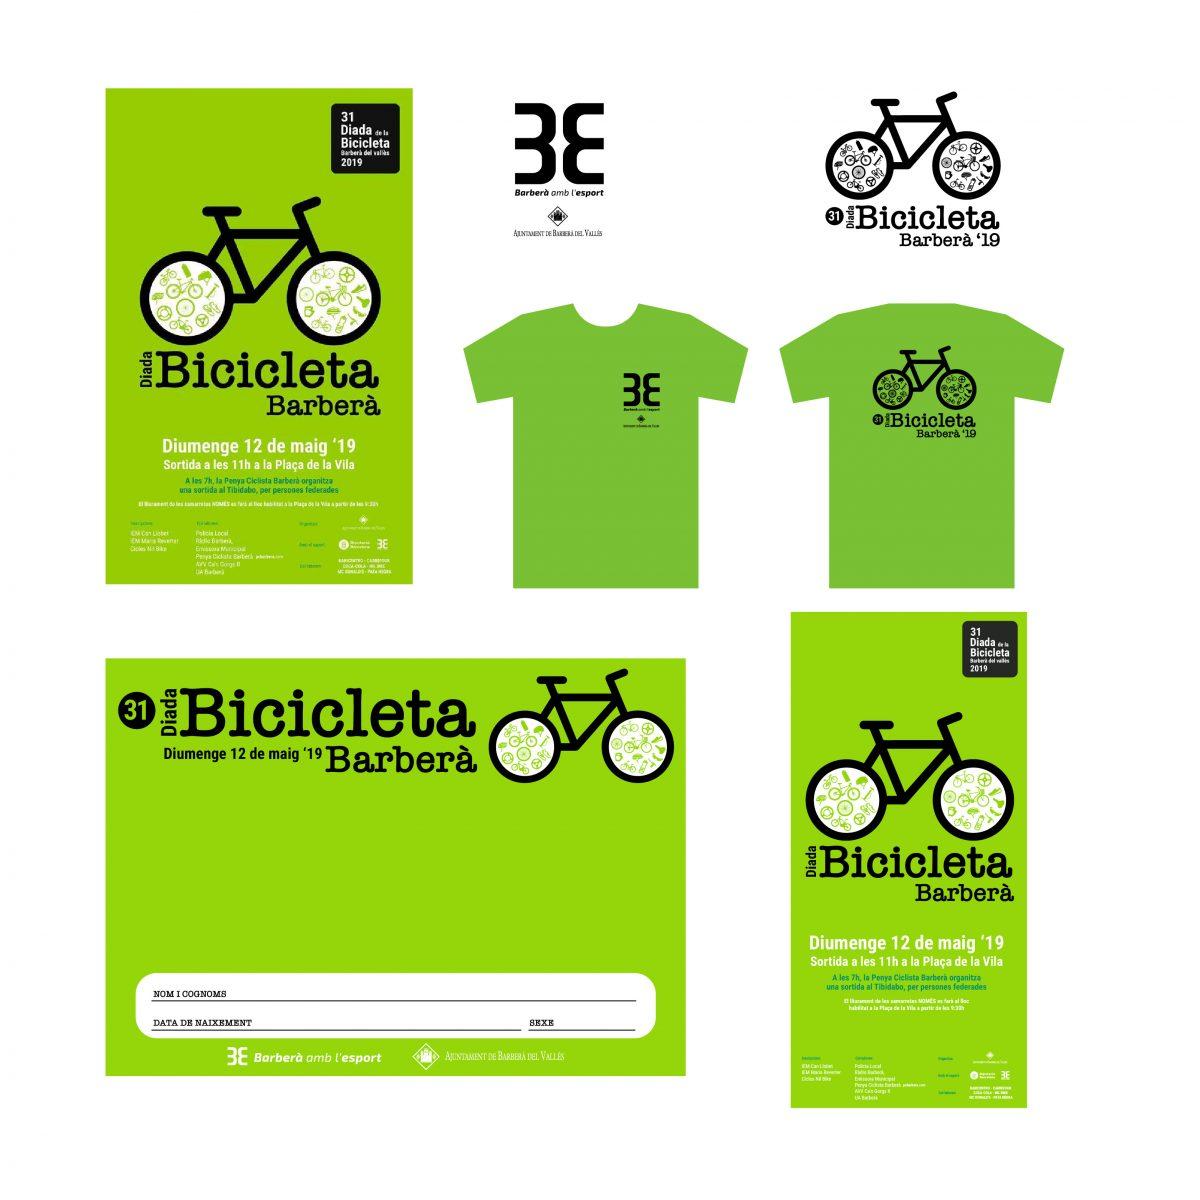 Bicicleta Barbera